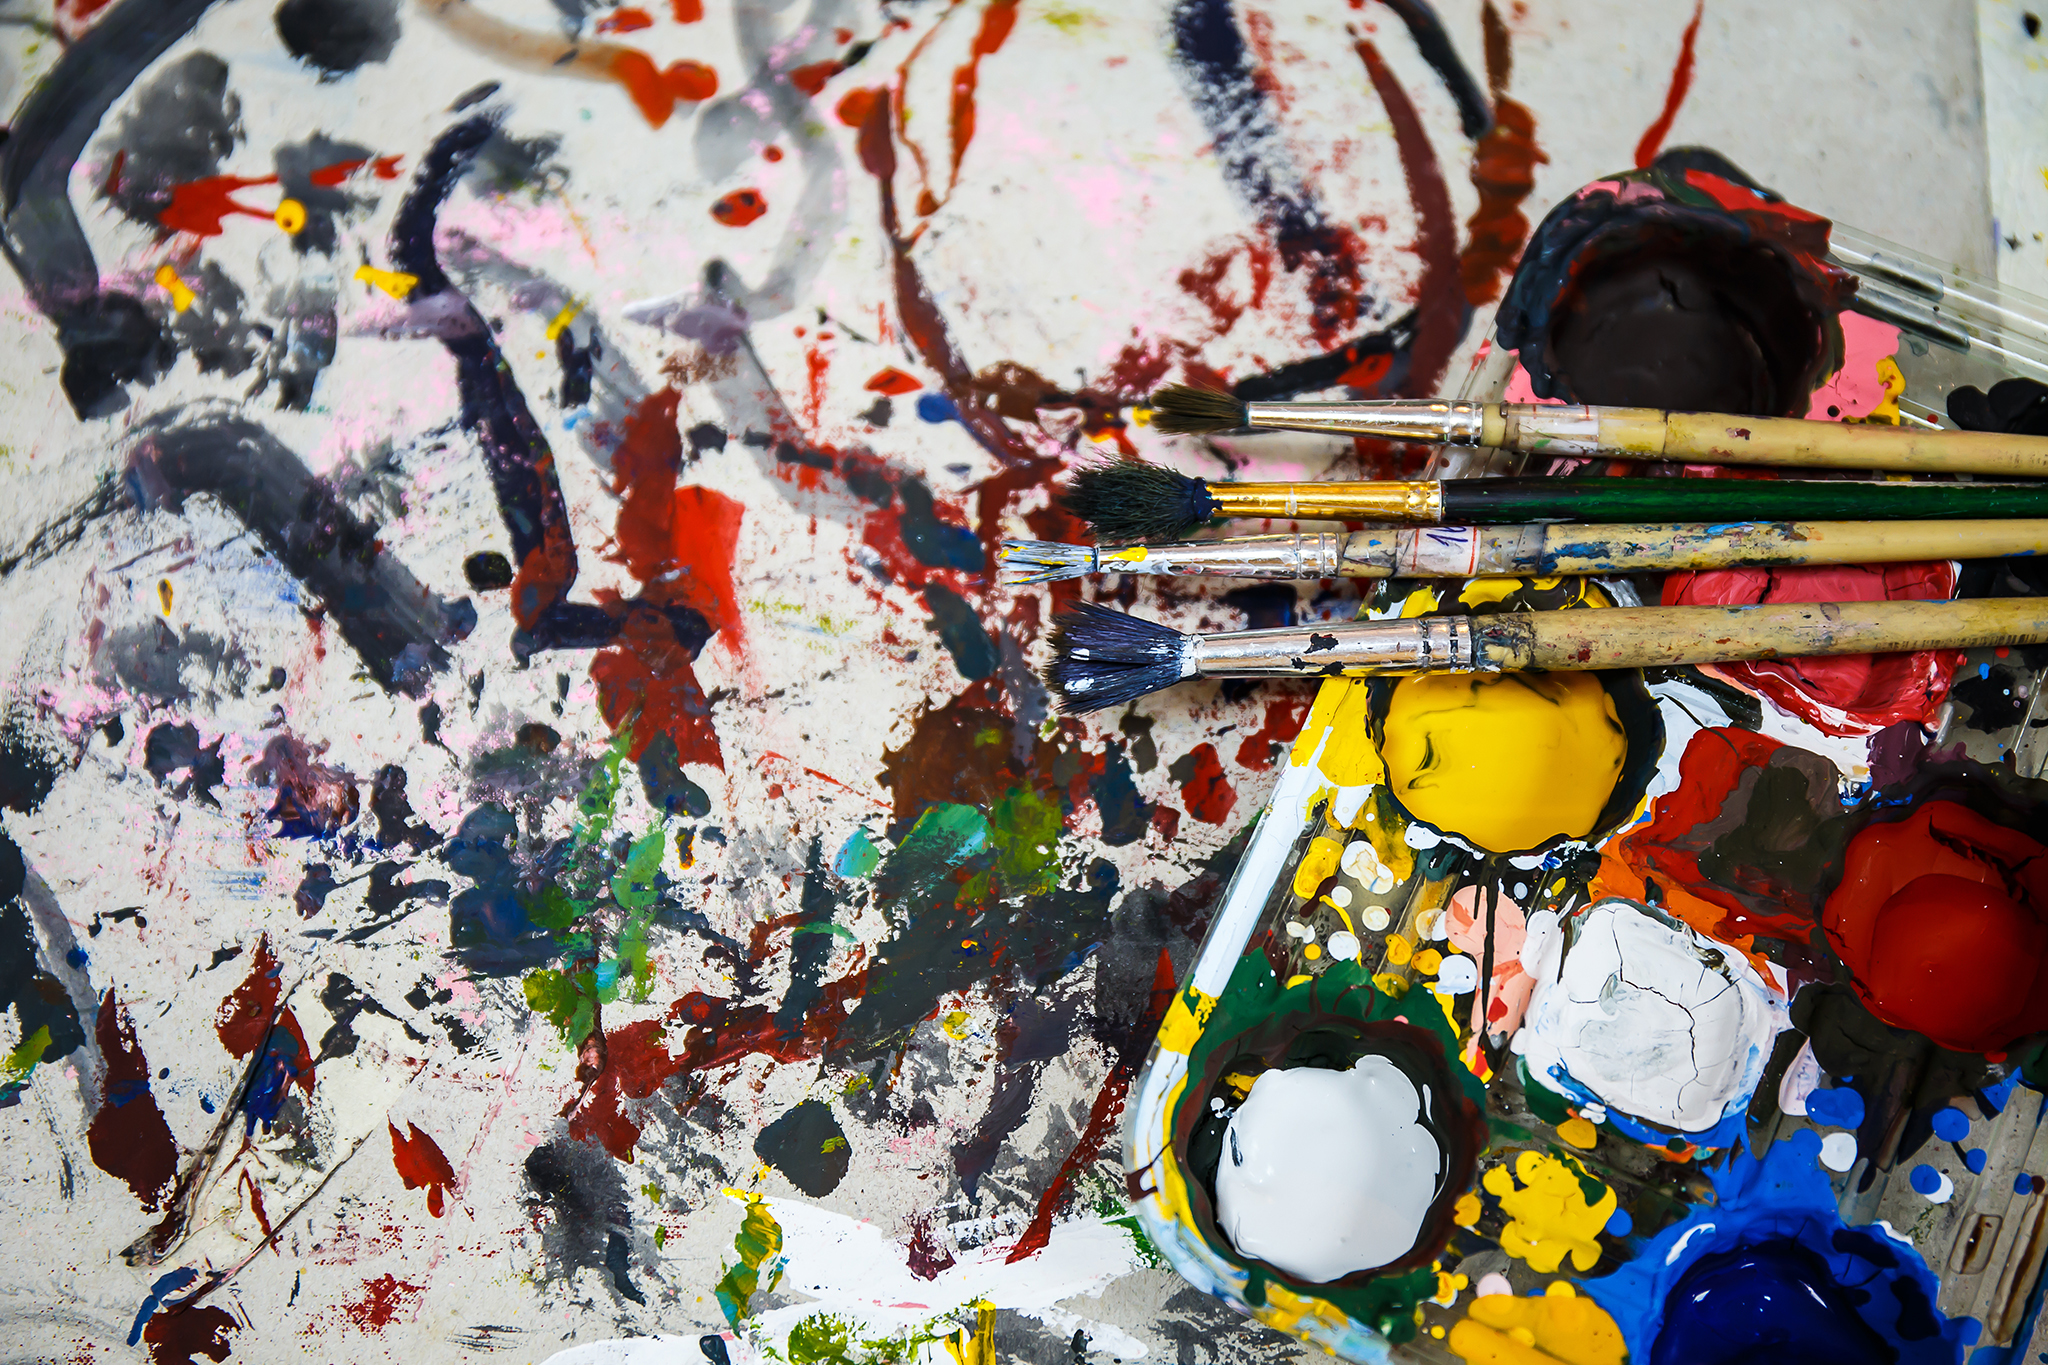 Creative chaos at Artjamz